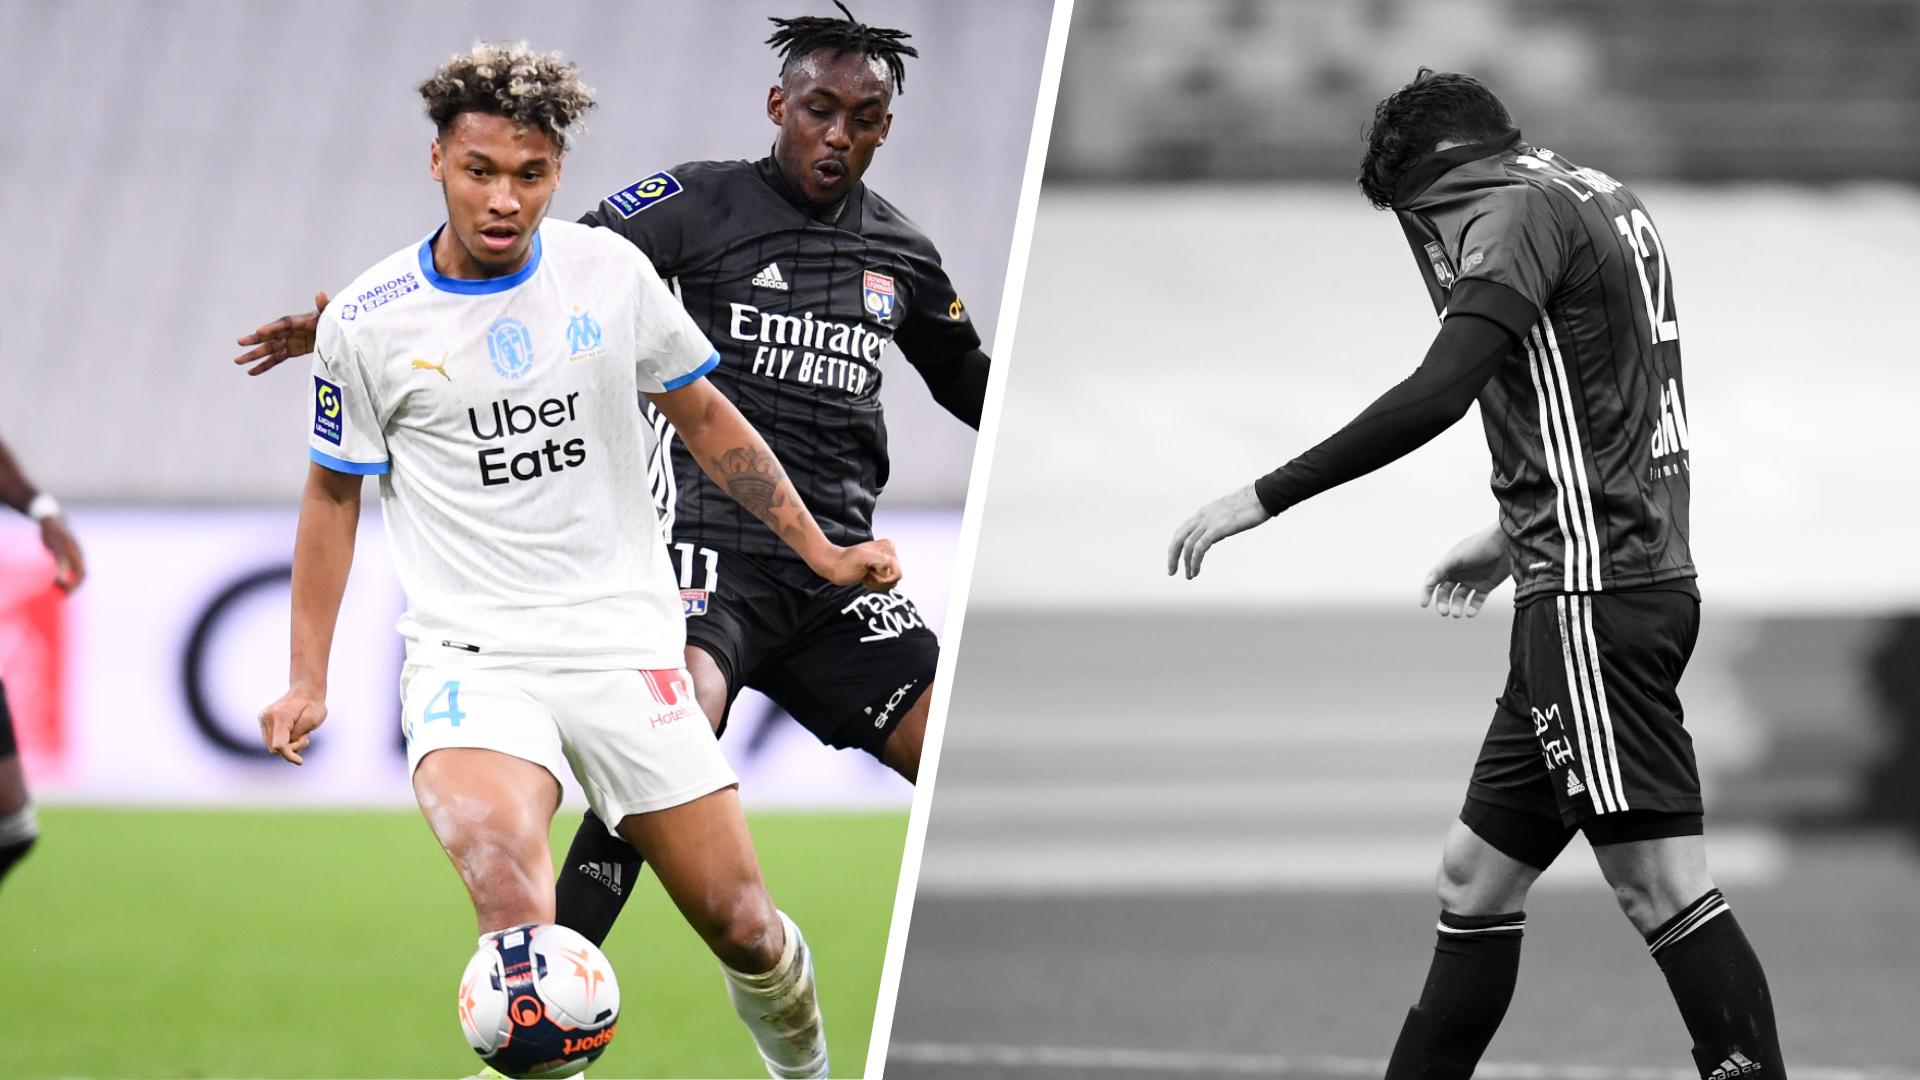 Kamara encore royal, Paqueta plombe l'OL ... Nos Tops et Flops après Marseille-Lyon - Le Figaro